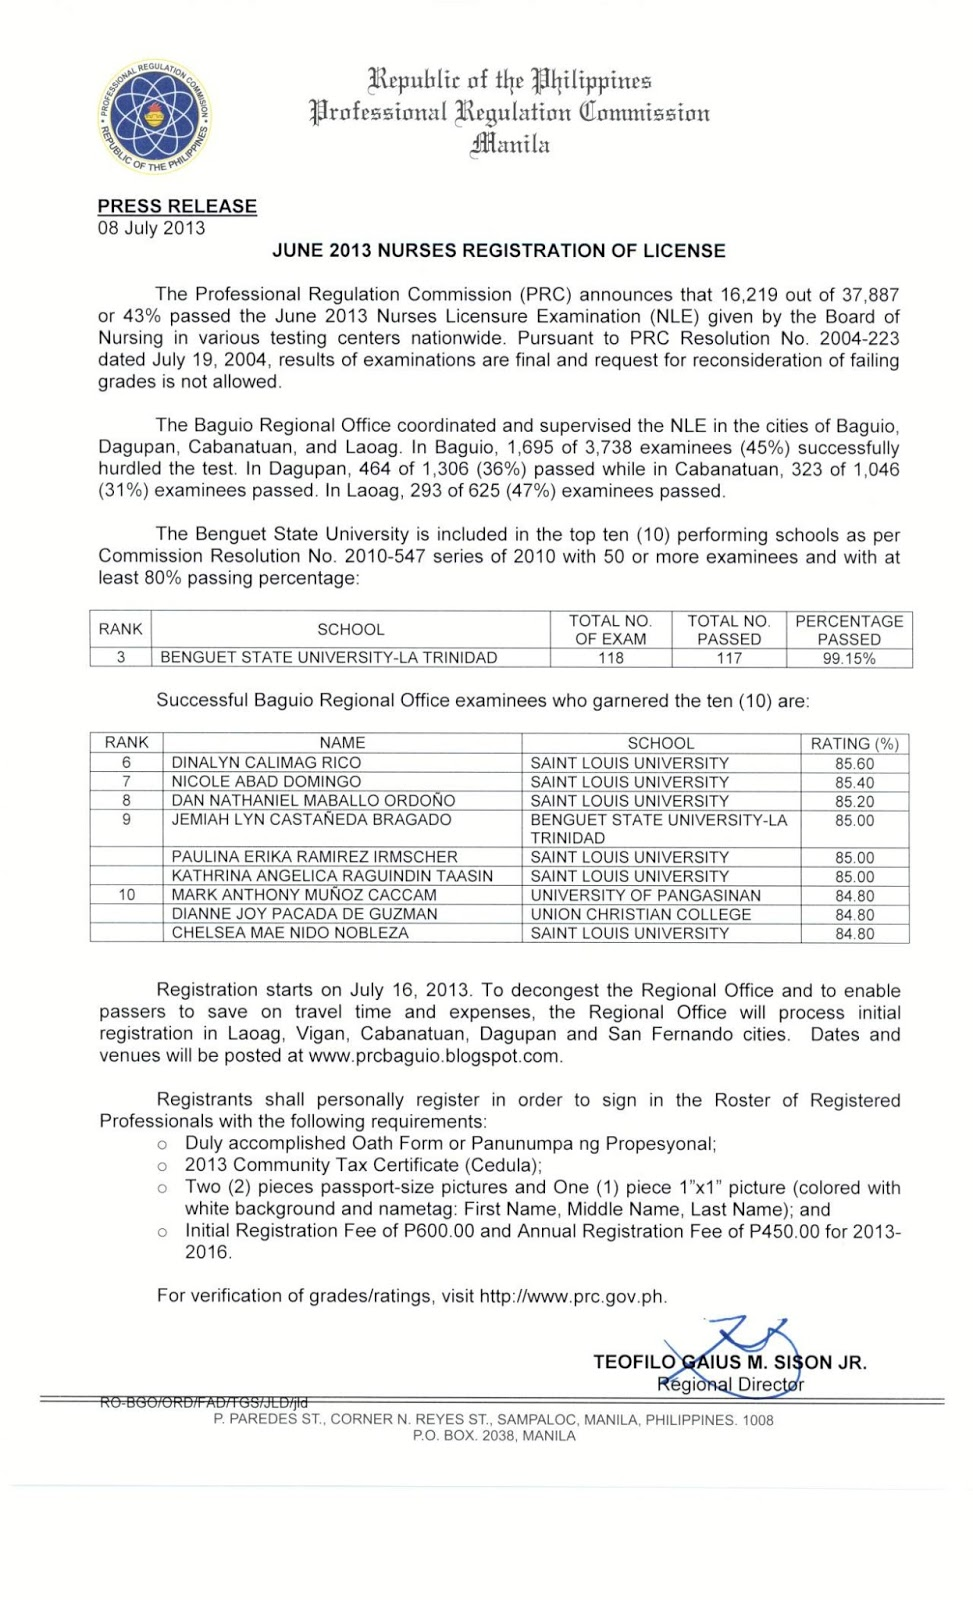 Prc baguio information site june 2013 nurses registration schedule yelopaper Images